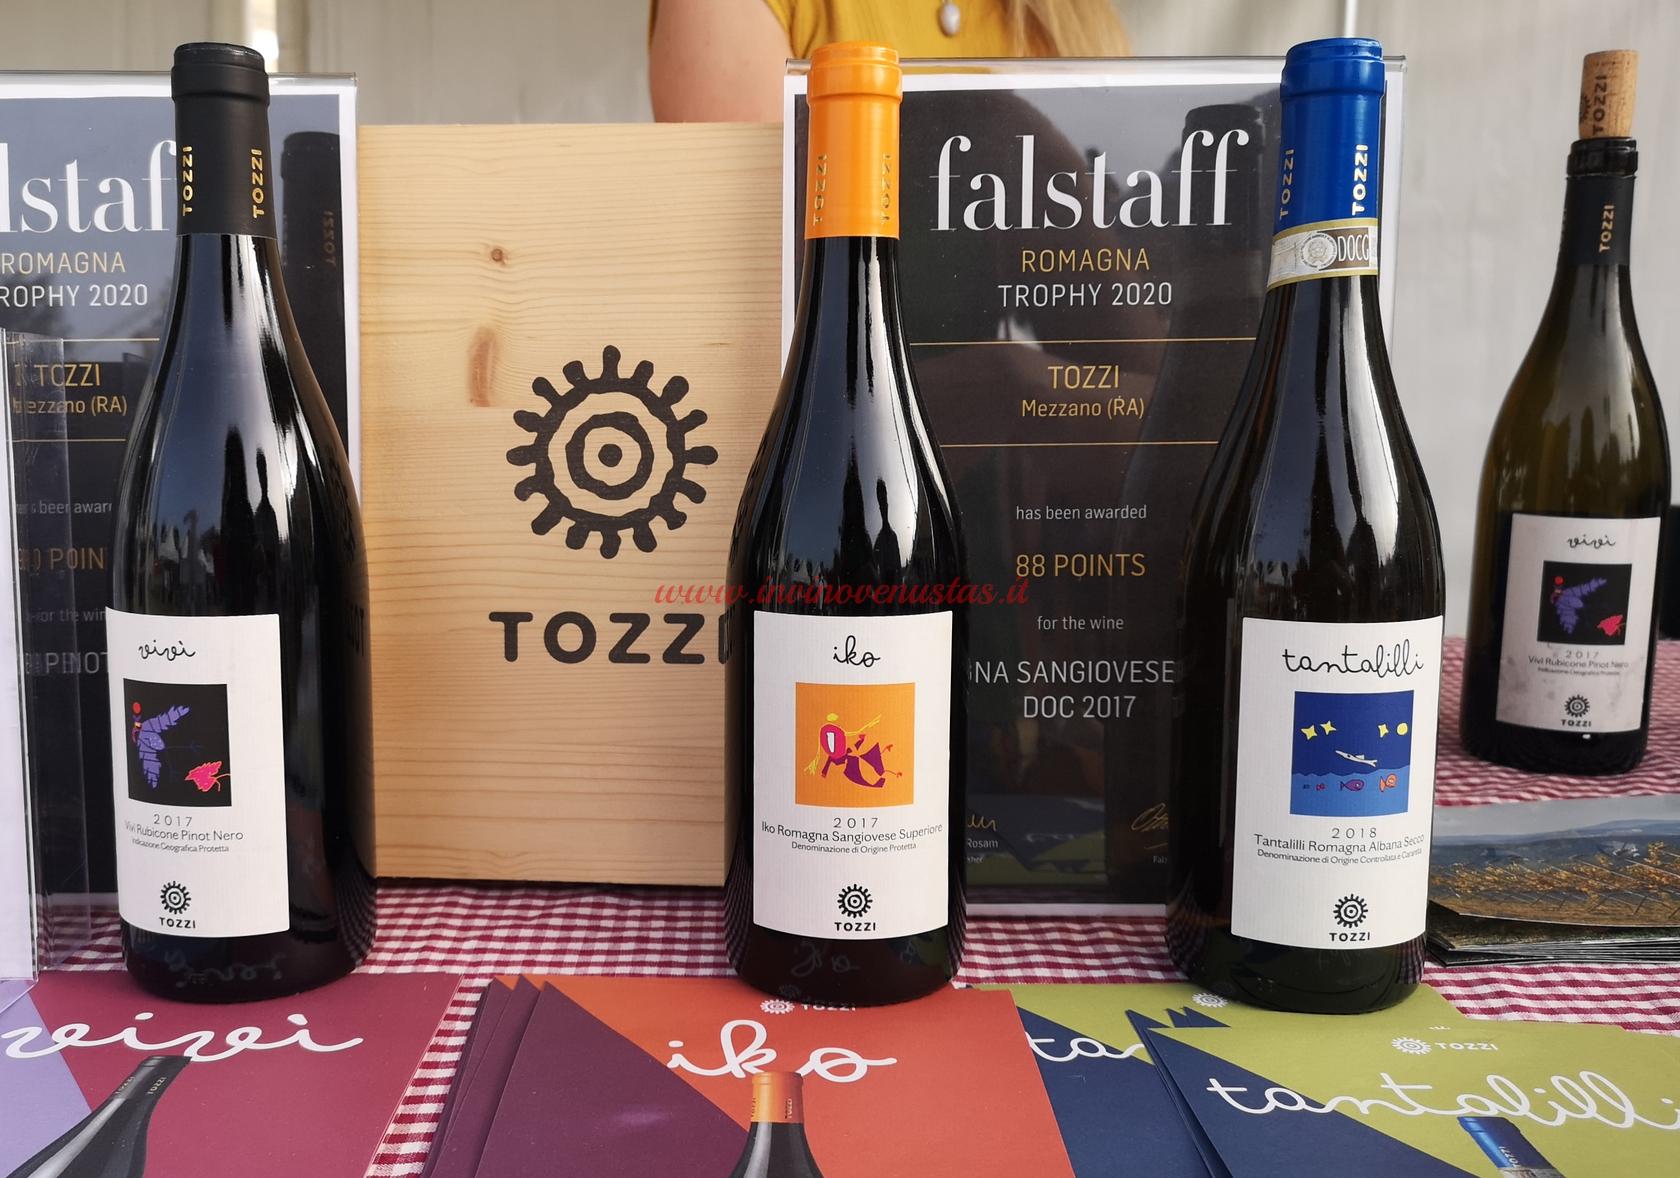 Vini Cantina Tozzi Emilia Romagna Only Wine